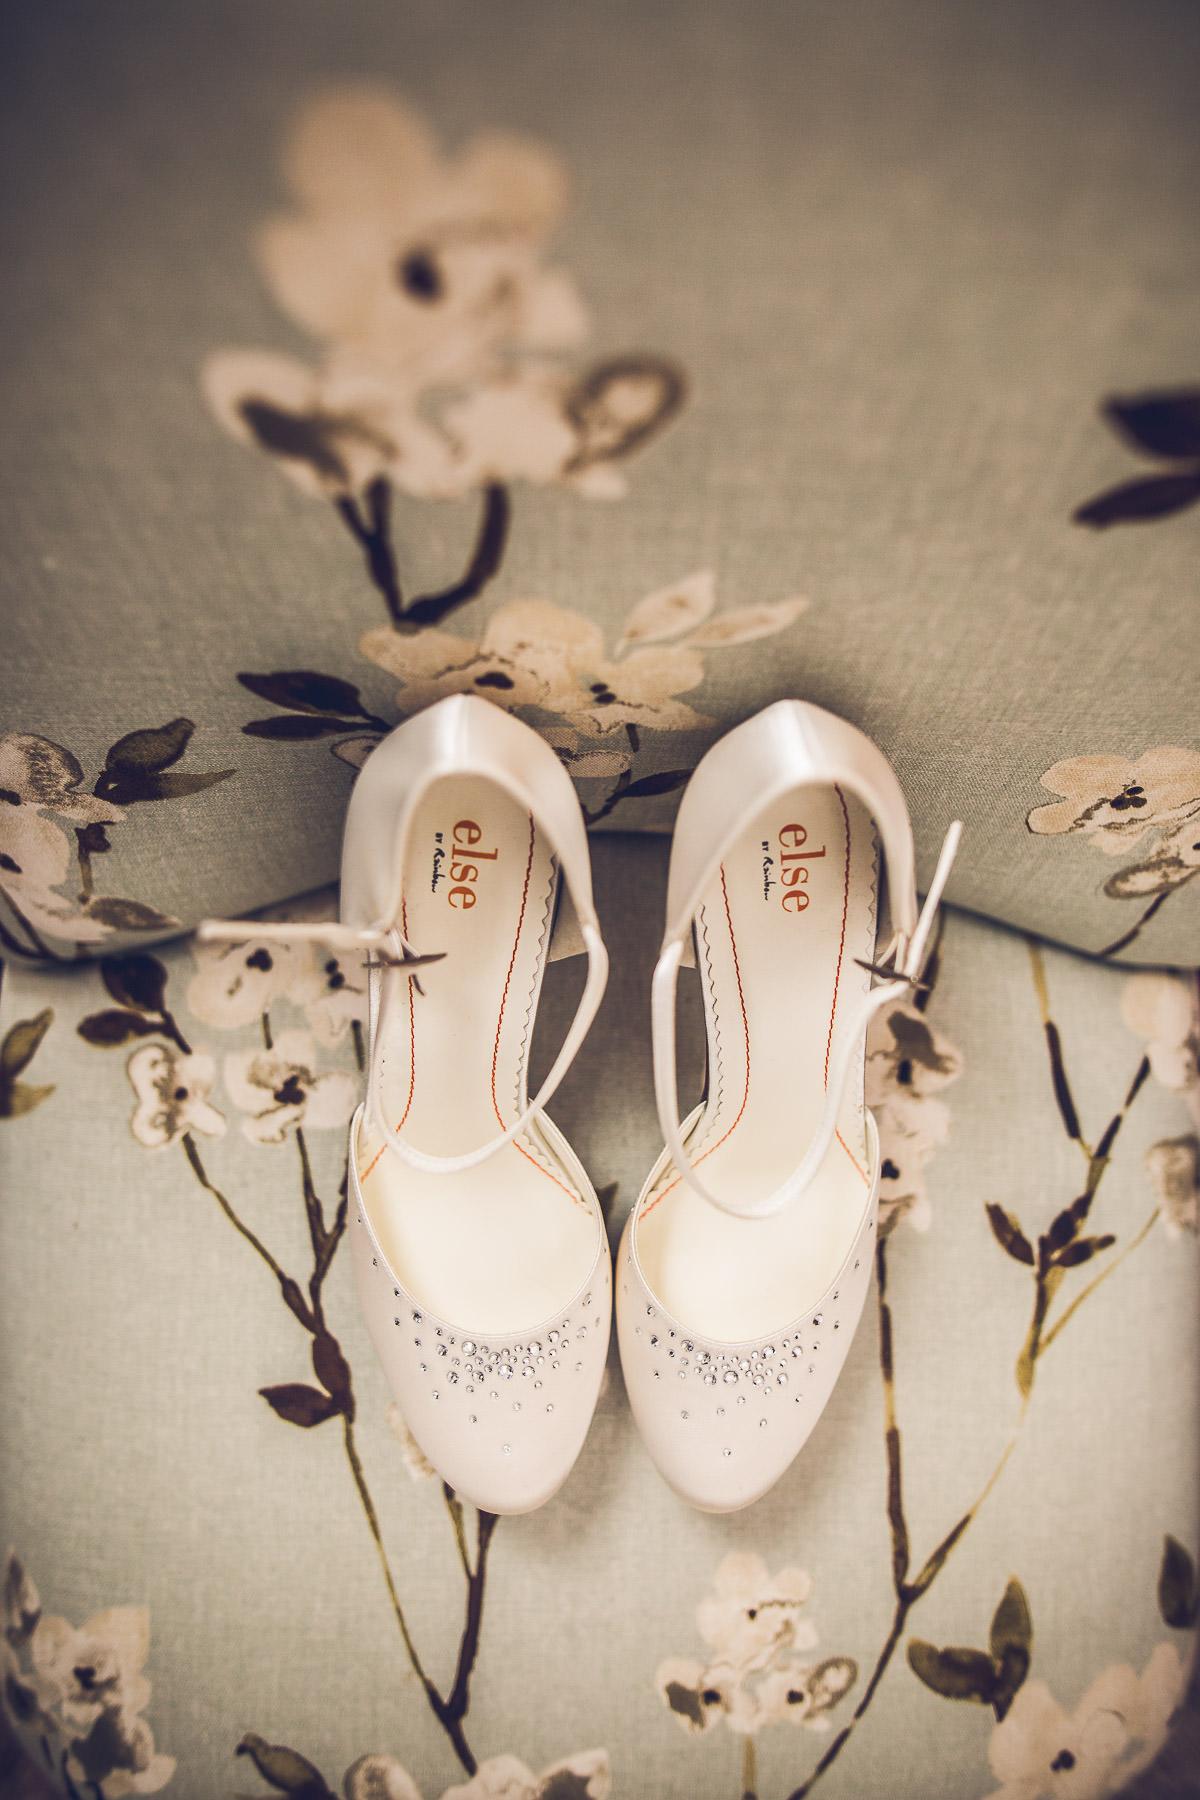 009 - Dumbleton Hall Wedding Photographer - Kate and Dave